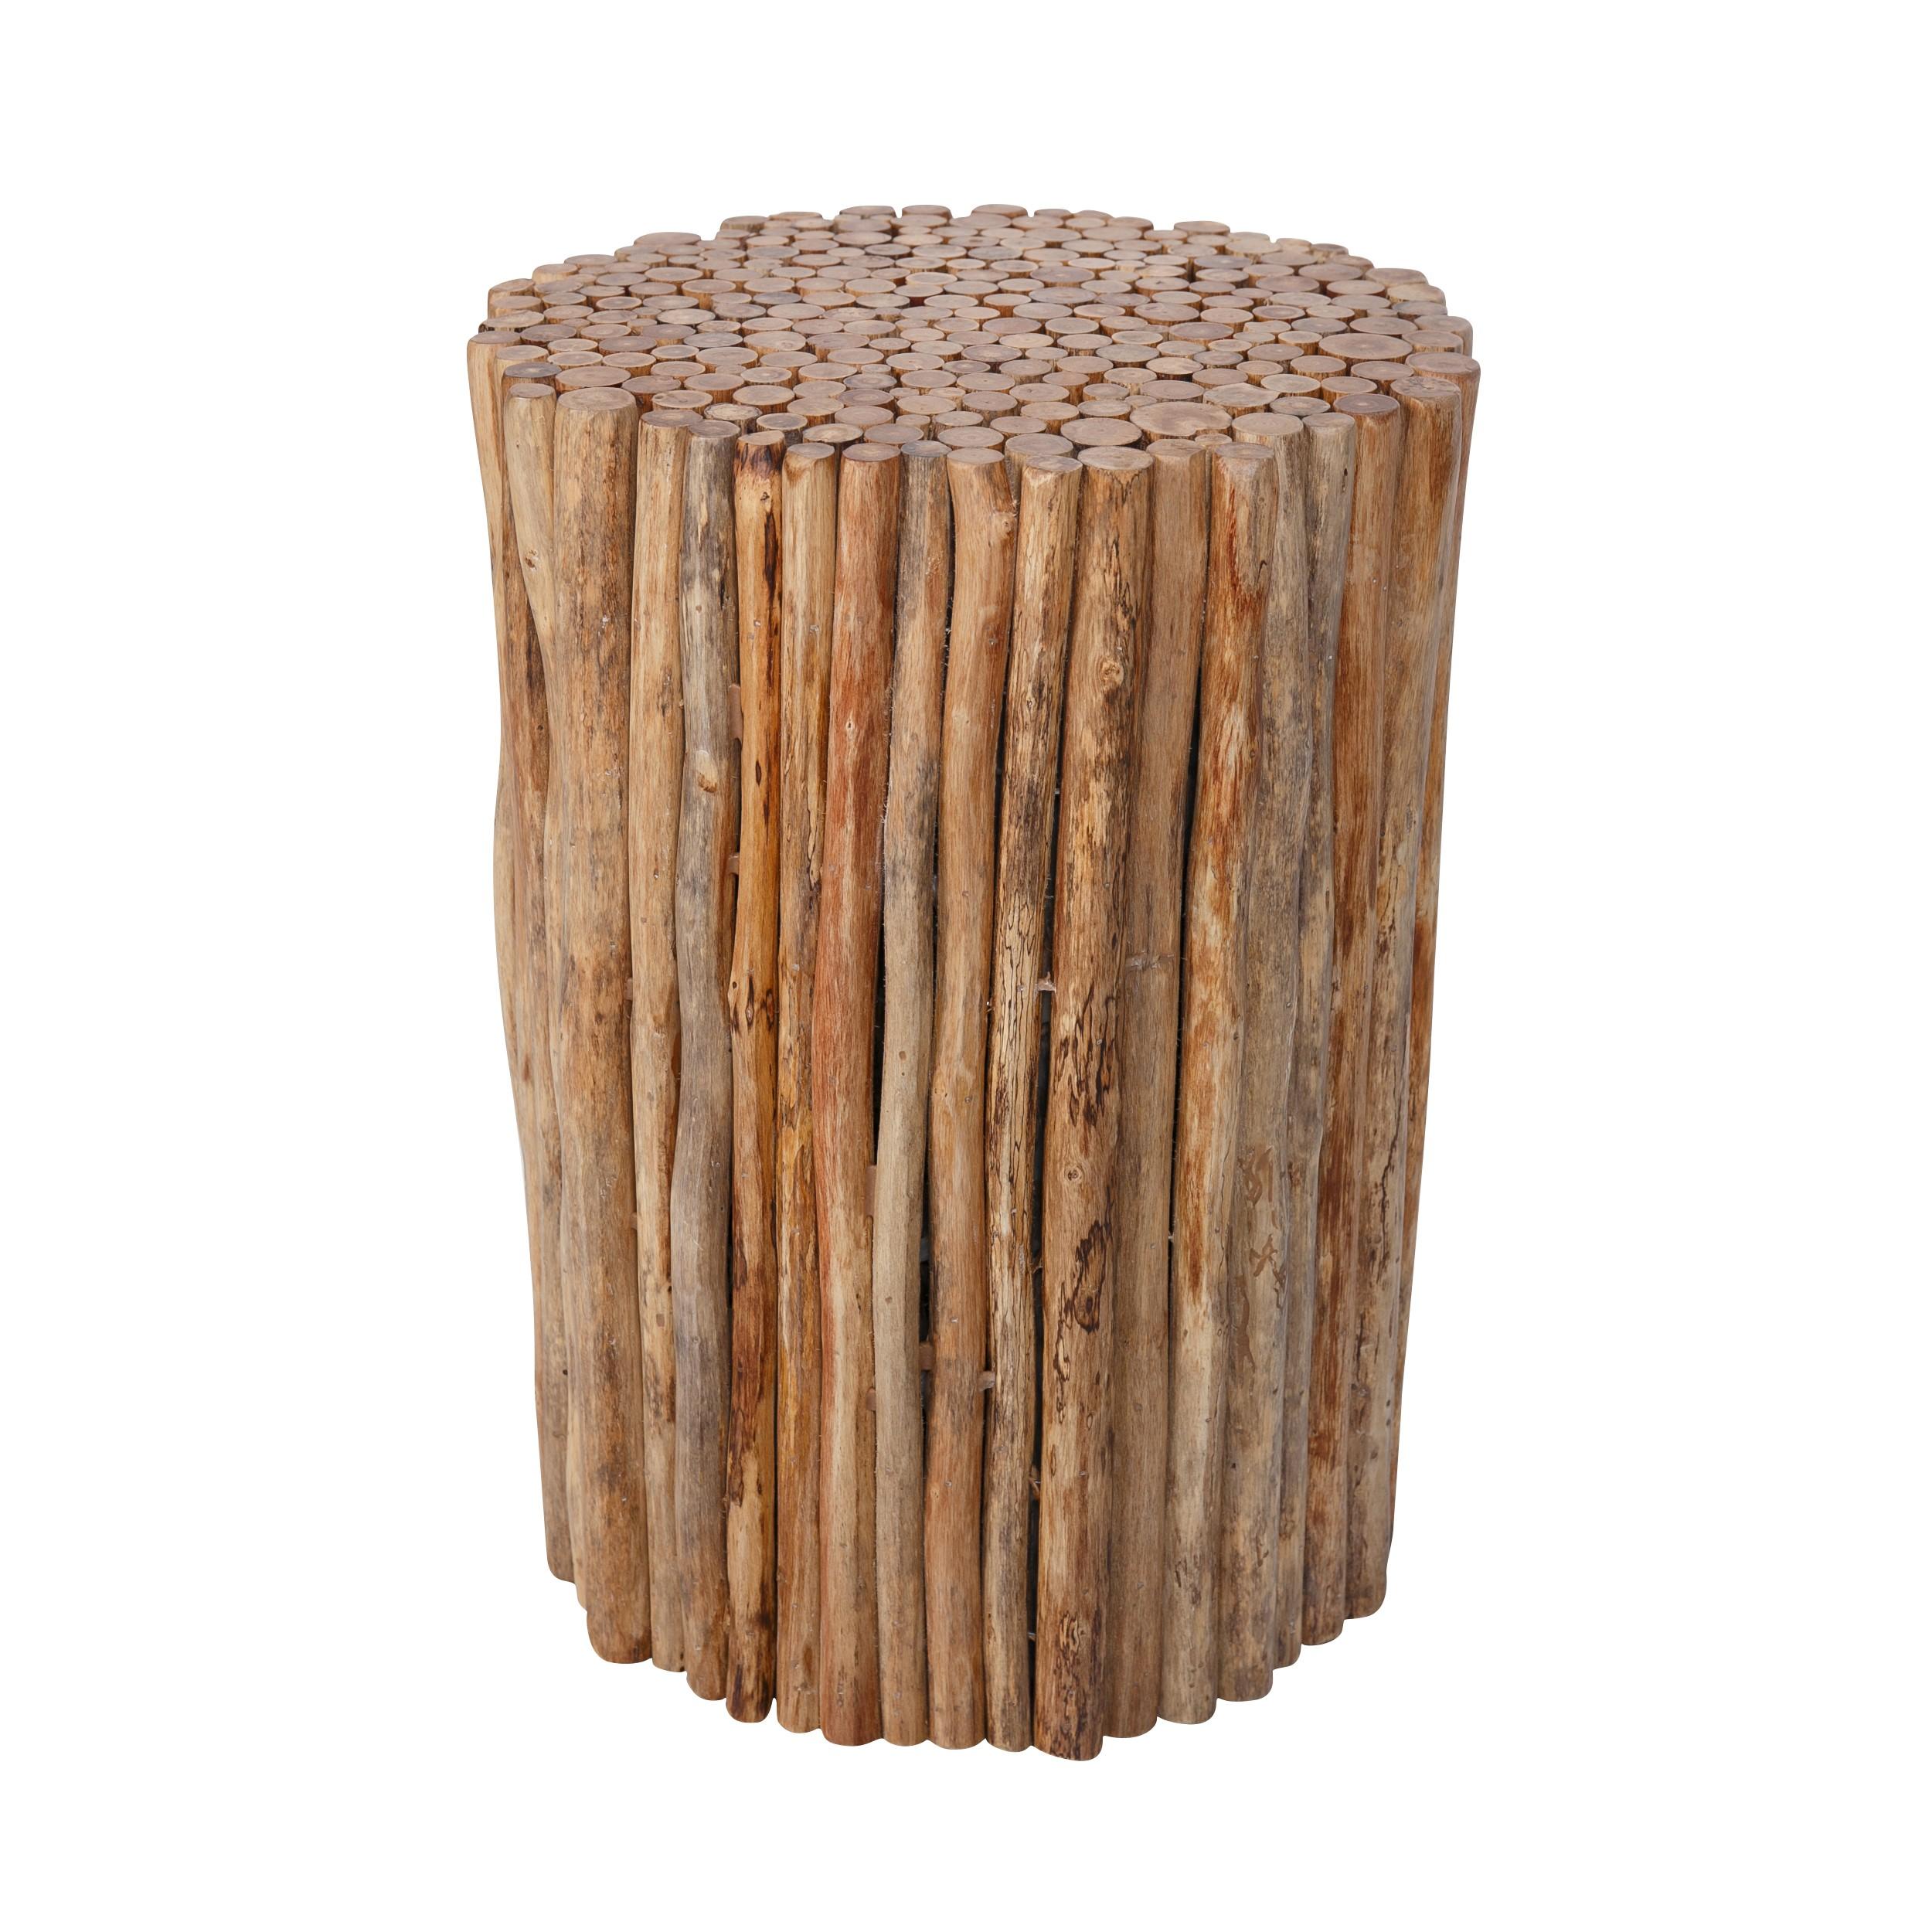 Rondin De Bois Table De Chevet table d'appoint biba en bois